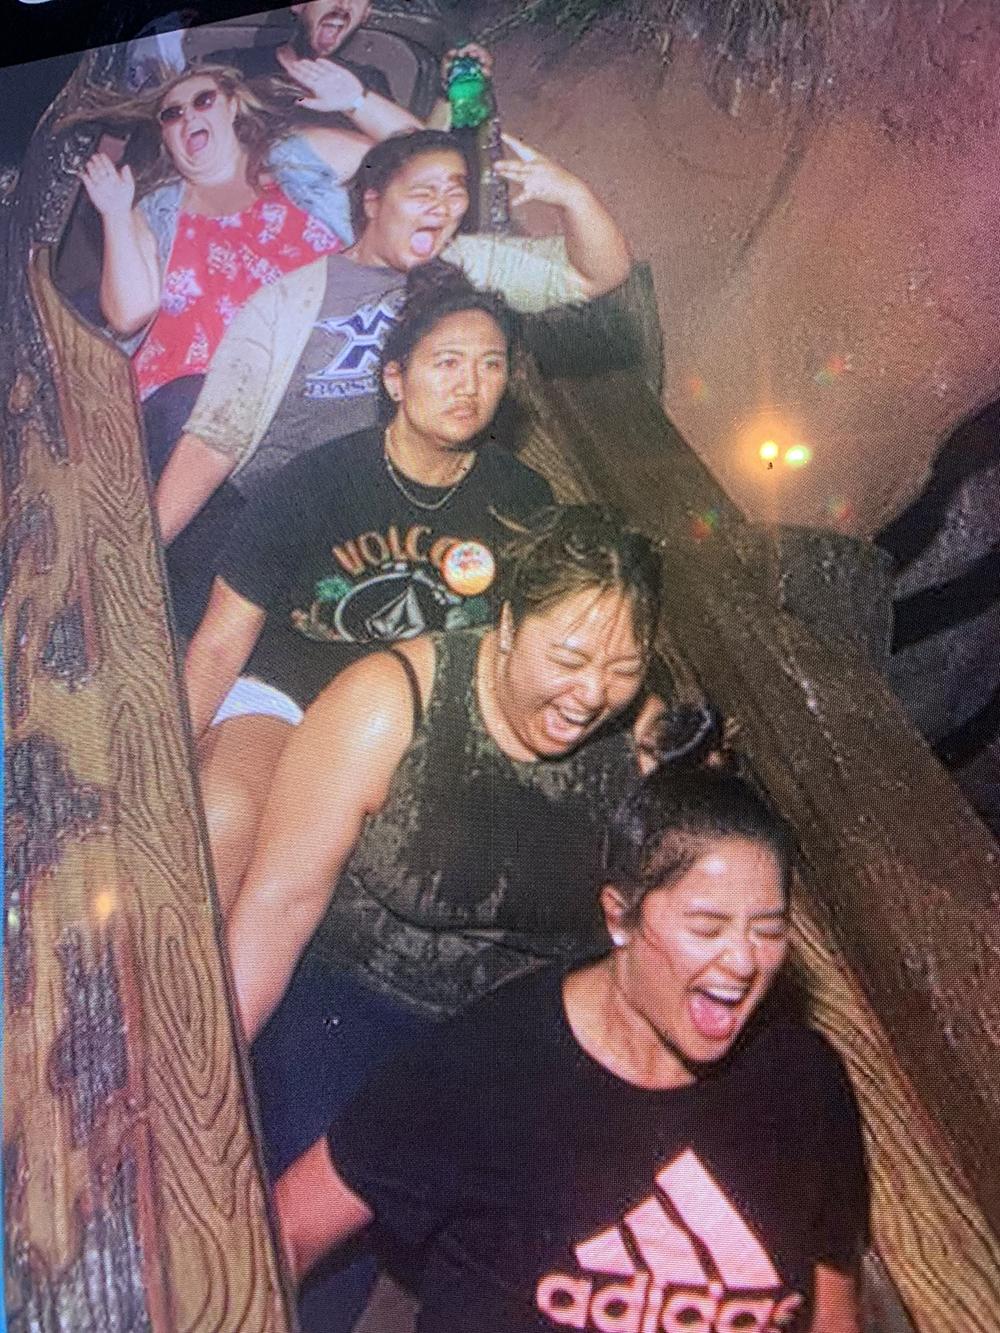 10/09/18 — The Garcia girls (first four seats) on Splash Mountain.